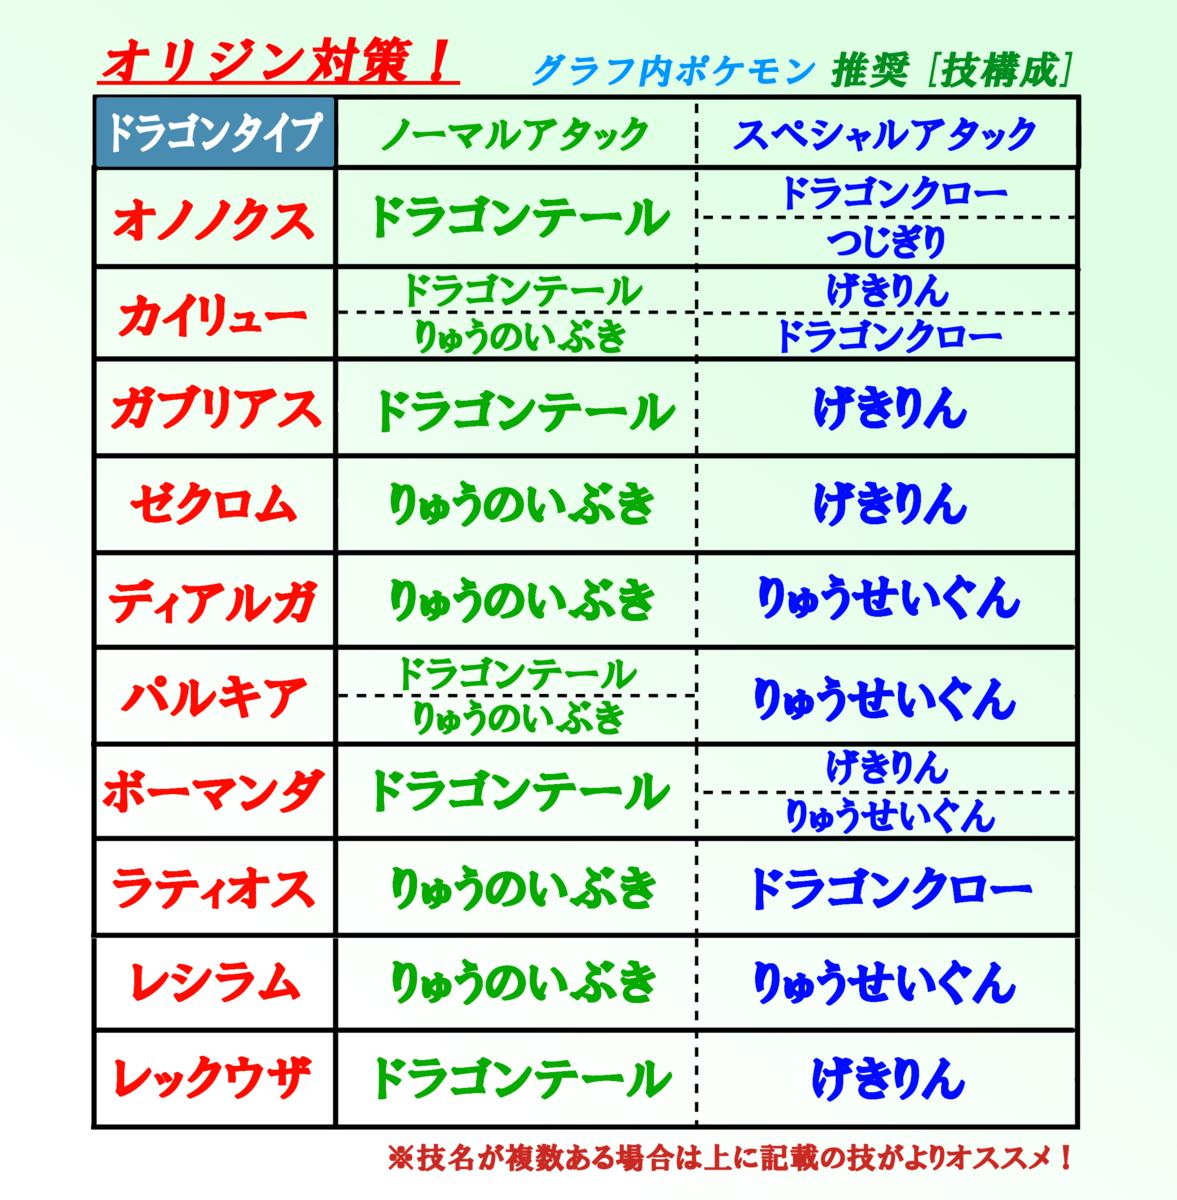 f:id:Kazumin0331:20201010012004p:plain